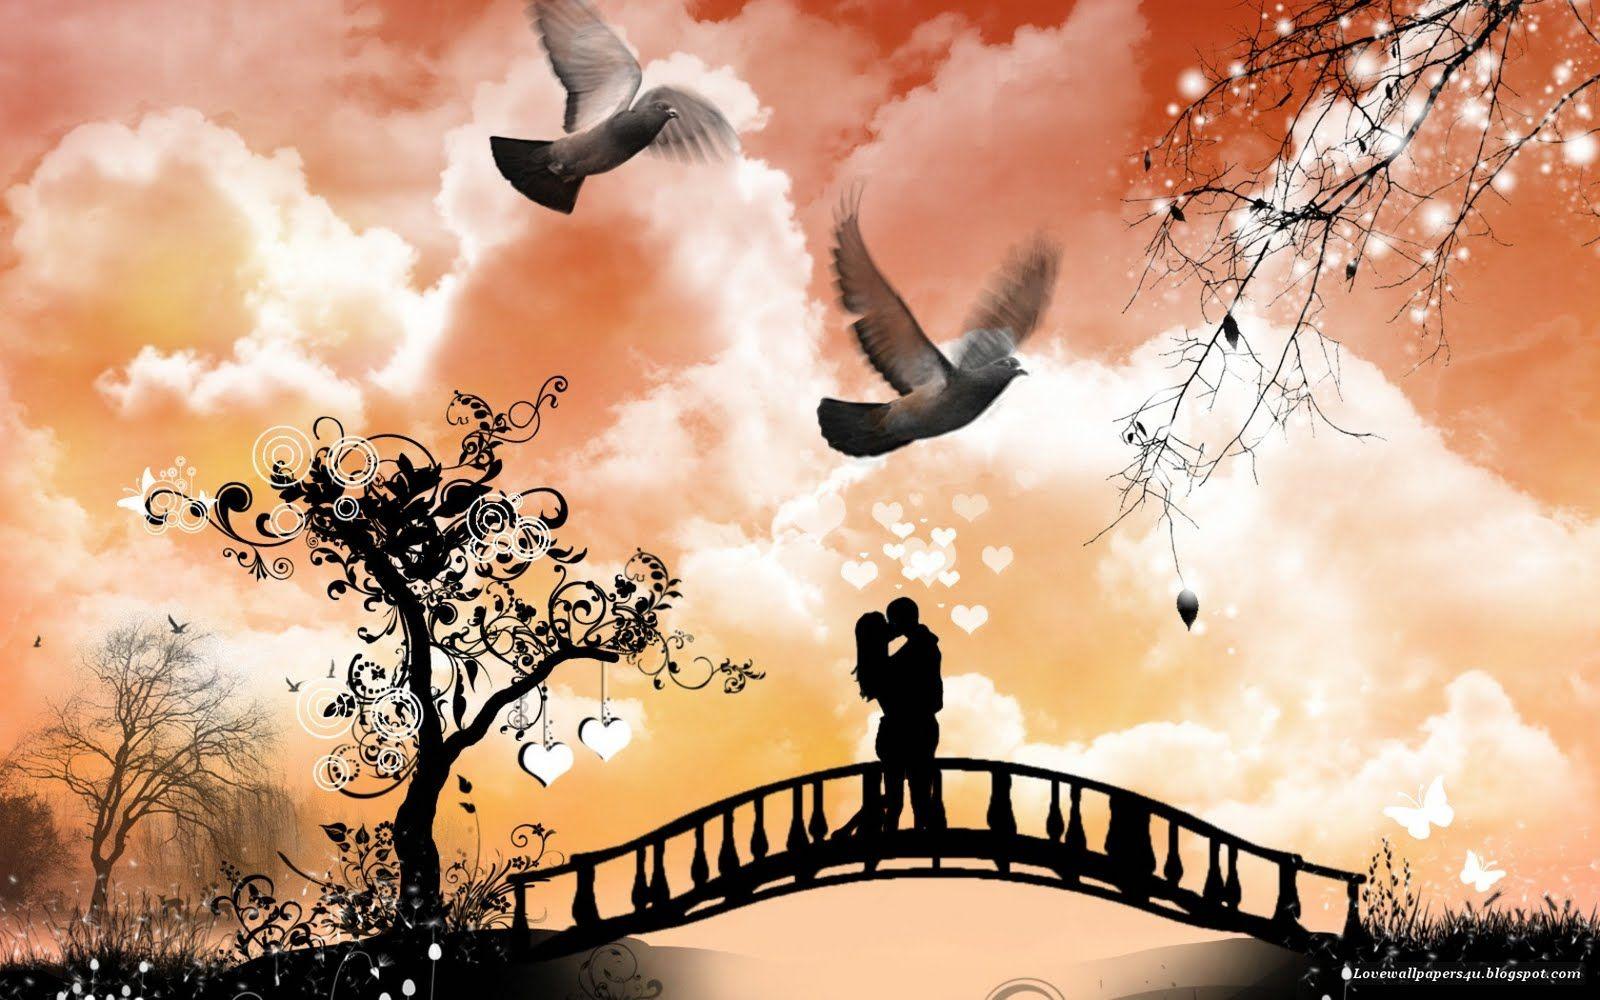 Full Hd P Best Hd Love Wallpapers Sh Love Hd Wallpapers Love Best Wallpaper Hd 1600x1000 Download Hd Wallpaper Wallpapertip